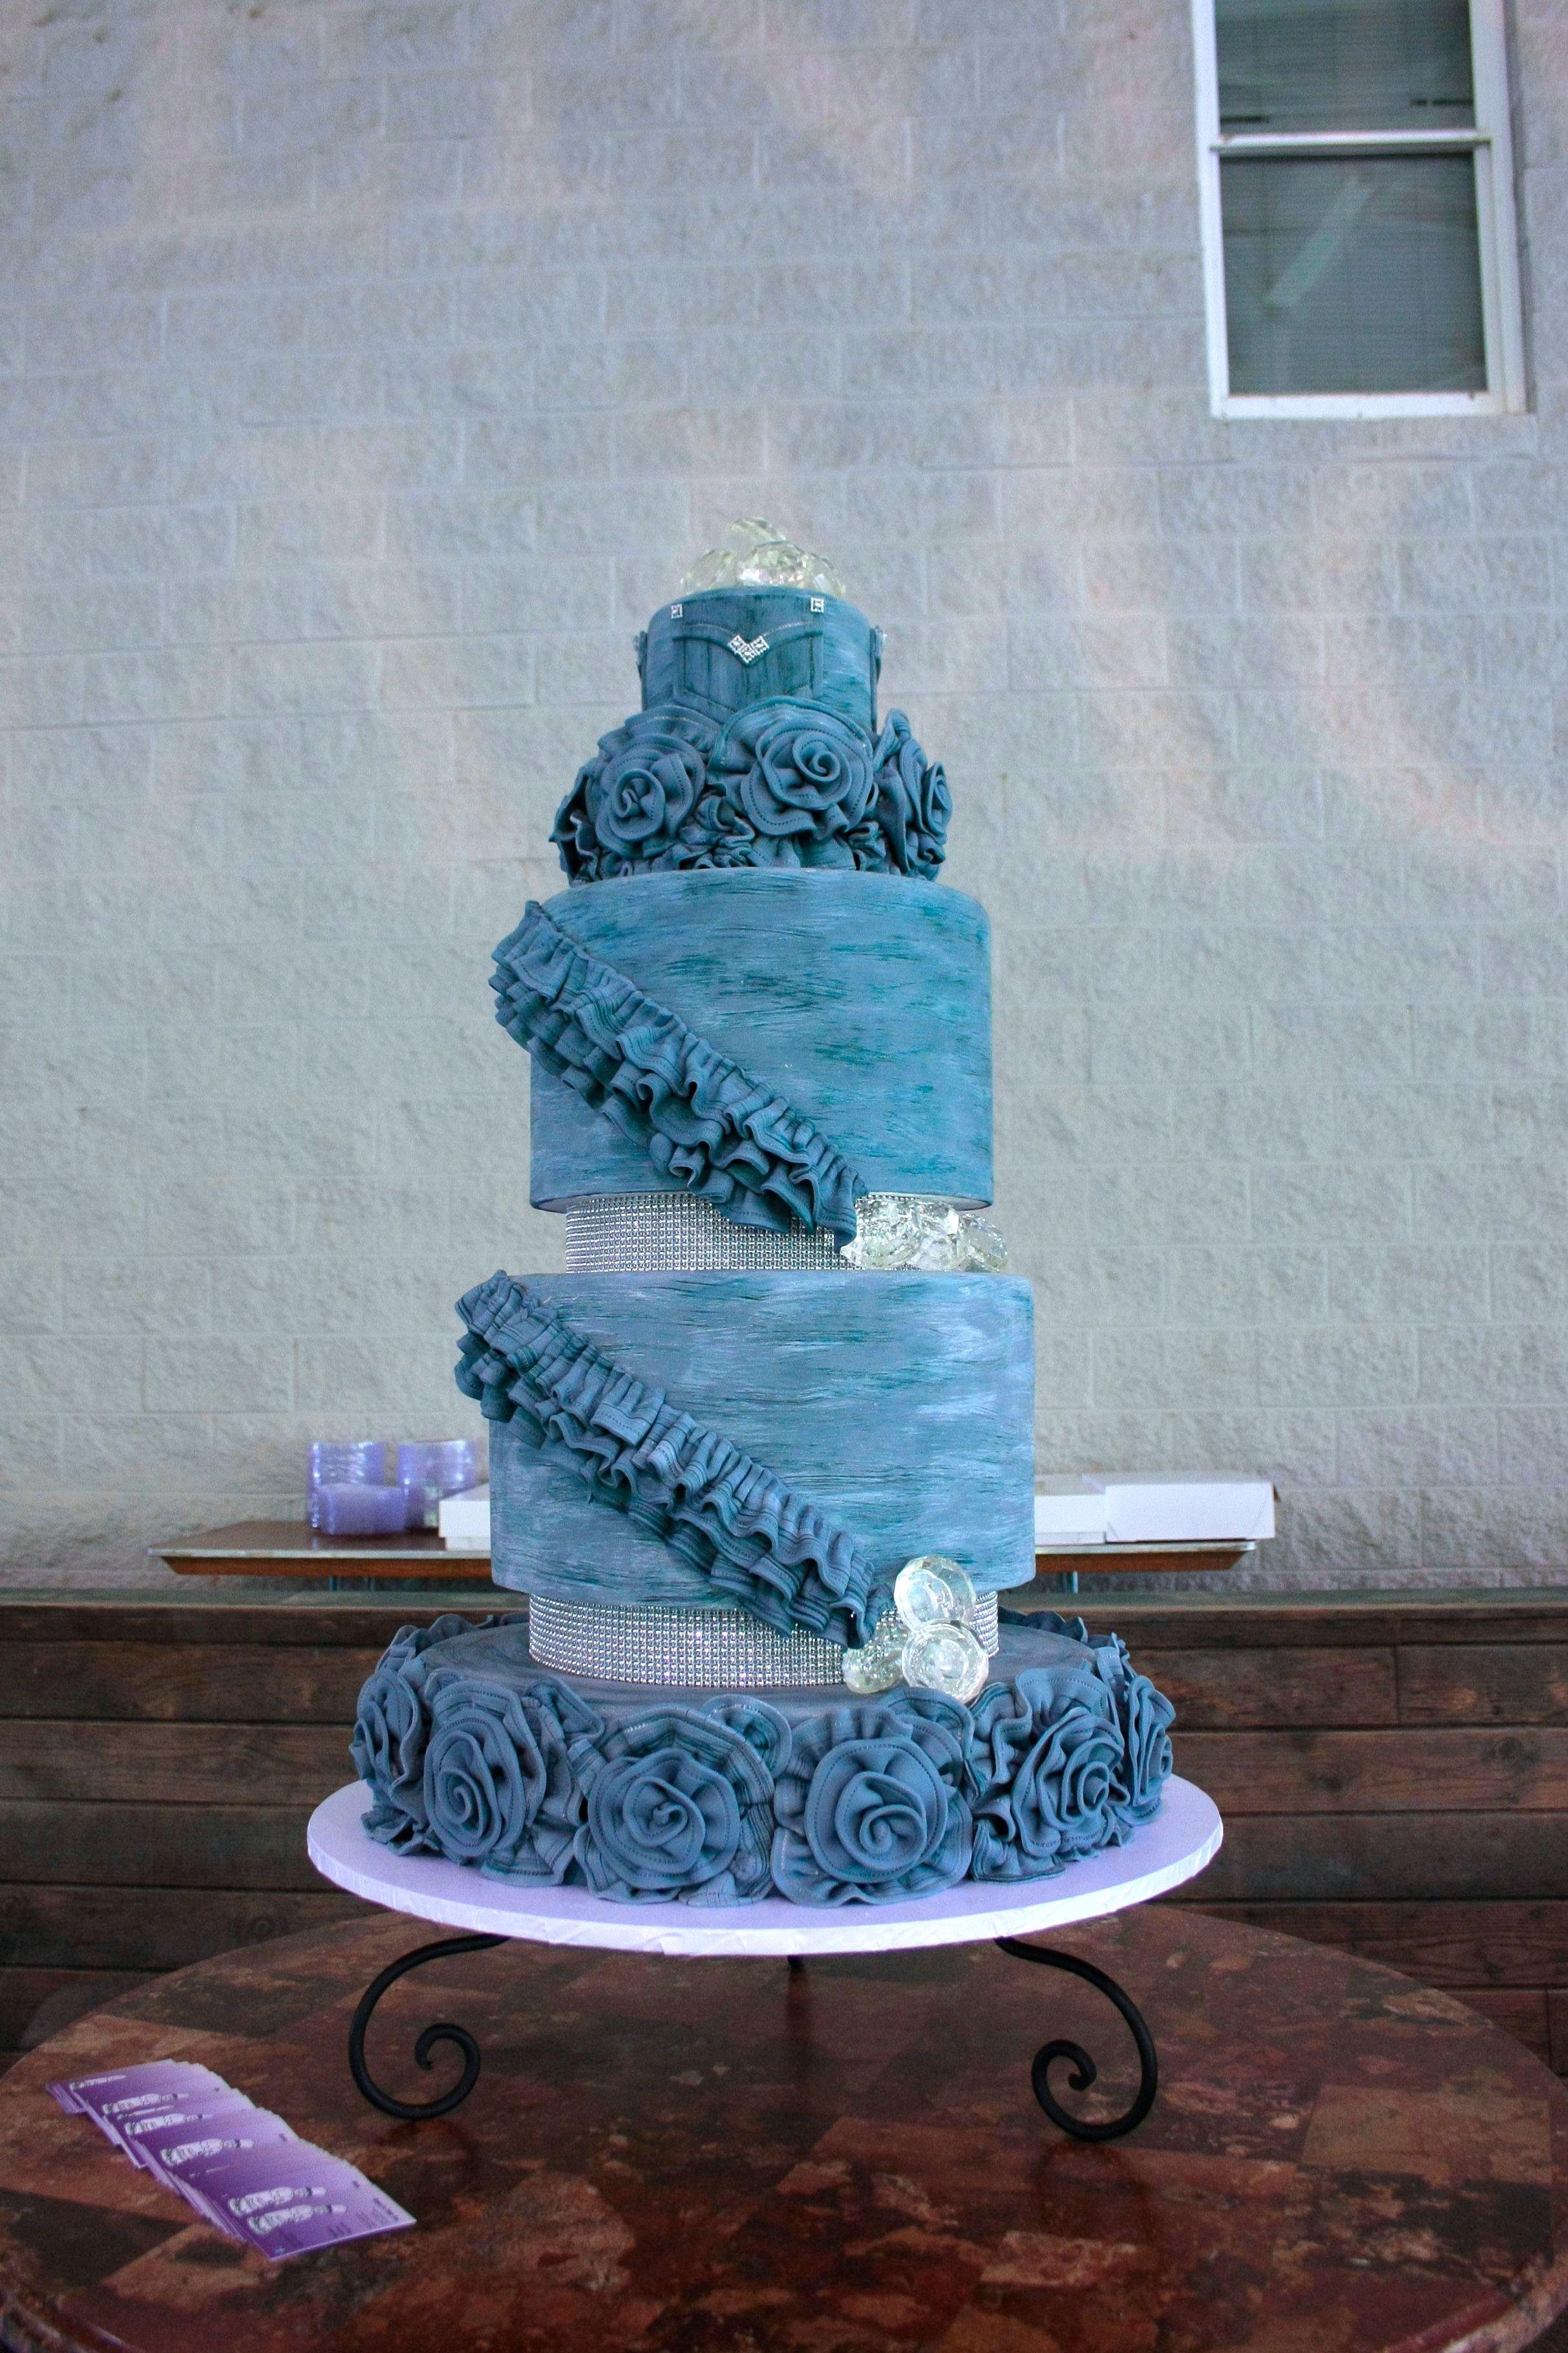 Denim Amp Diamond Cake By Bakers Man Denim Amp Diamonds 2013